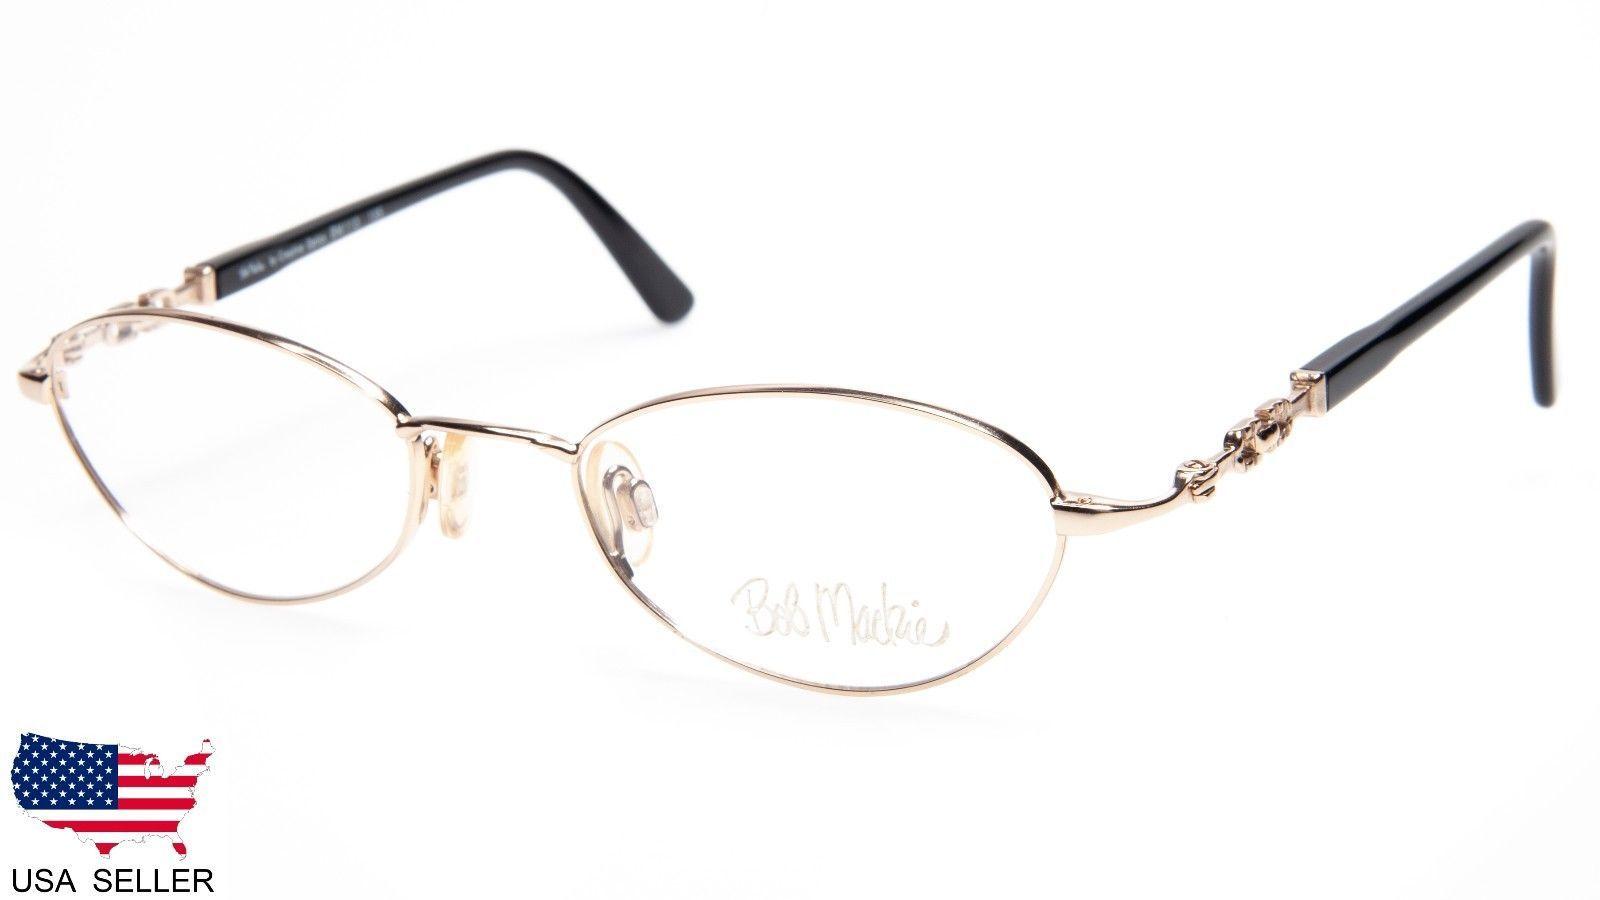 Bob Mackie Eyeglass Frame: 42 listings